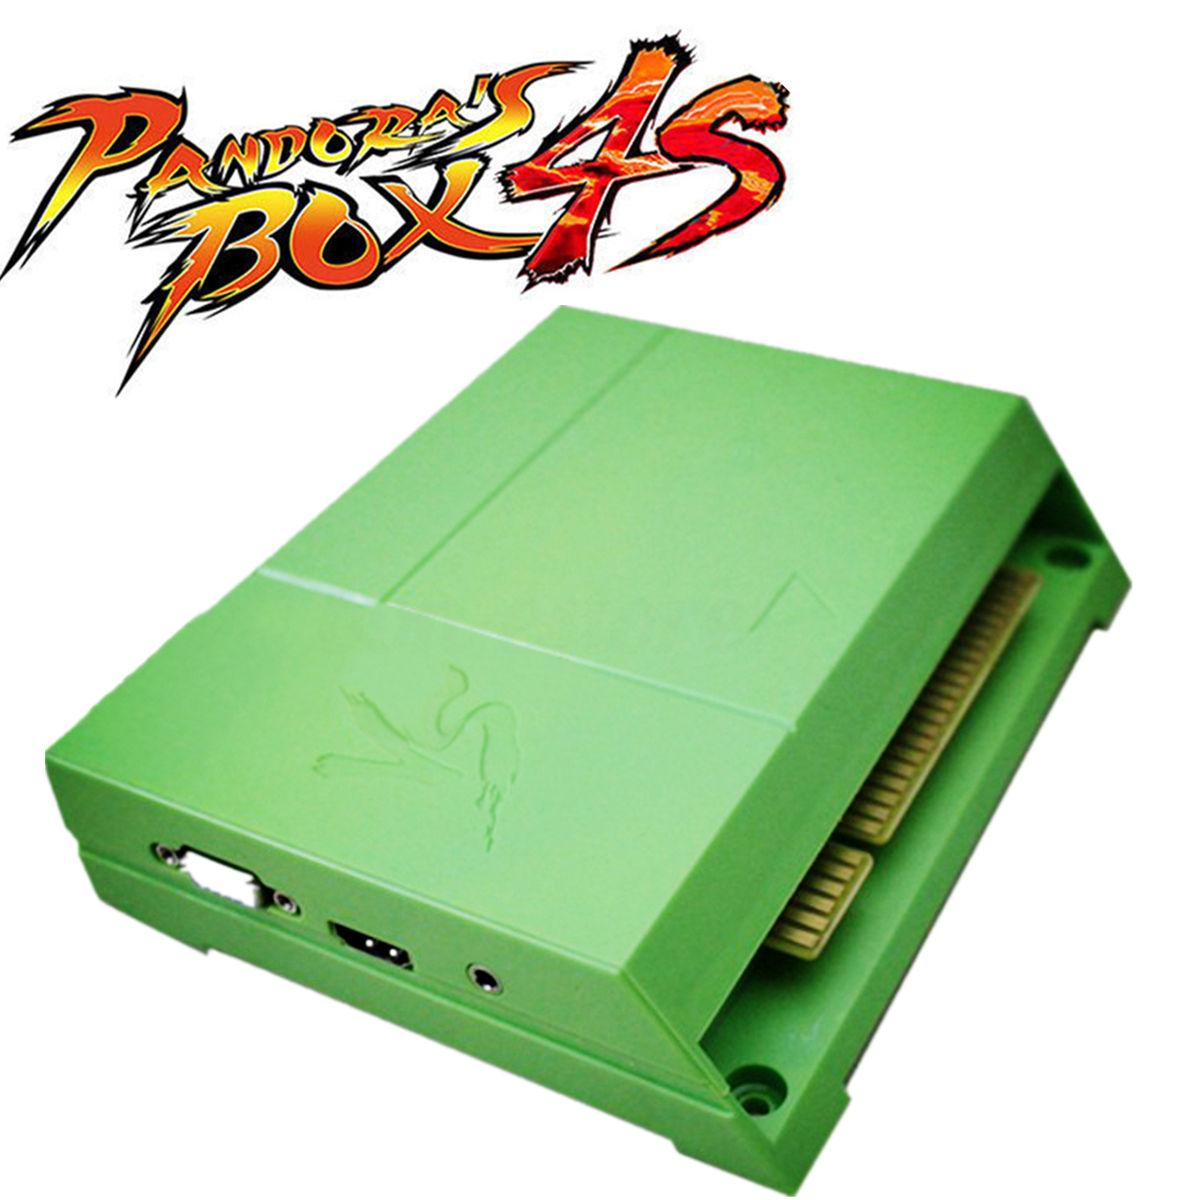 Arcade Jukebox Pinball60 In 1 Jamma Multigame Pcb Icade Wiring Harness 800 Pandoras Box 4s Heros Of Storm 4 Game Board Vgahdmi